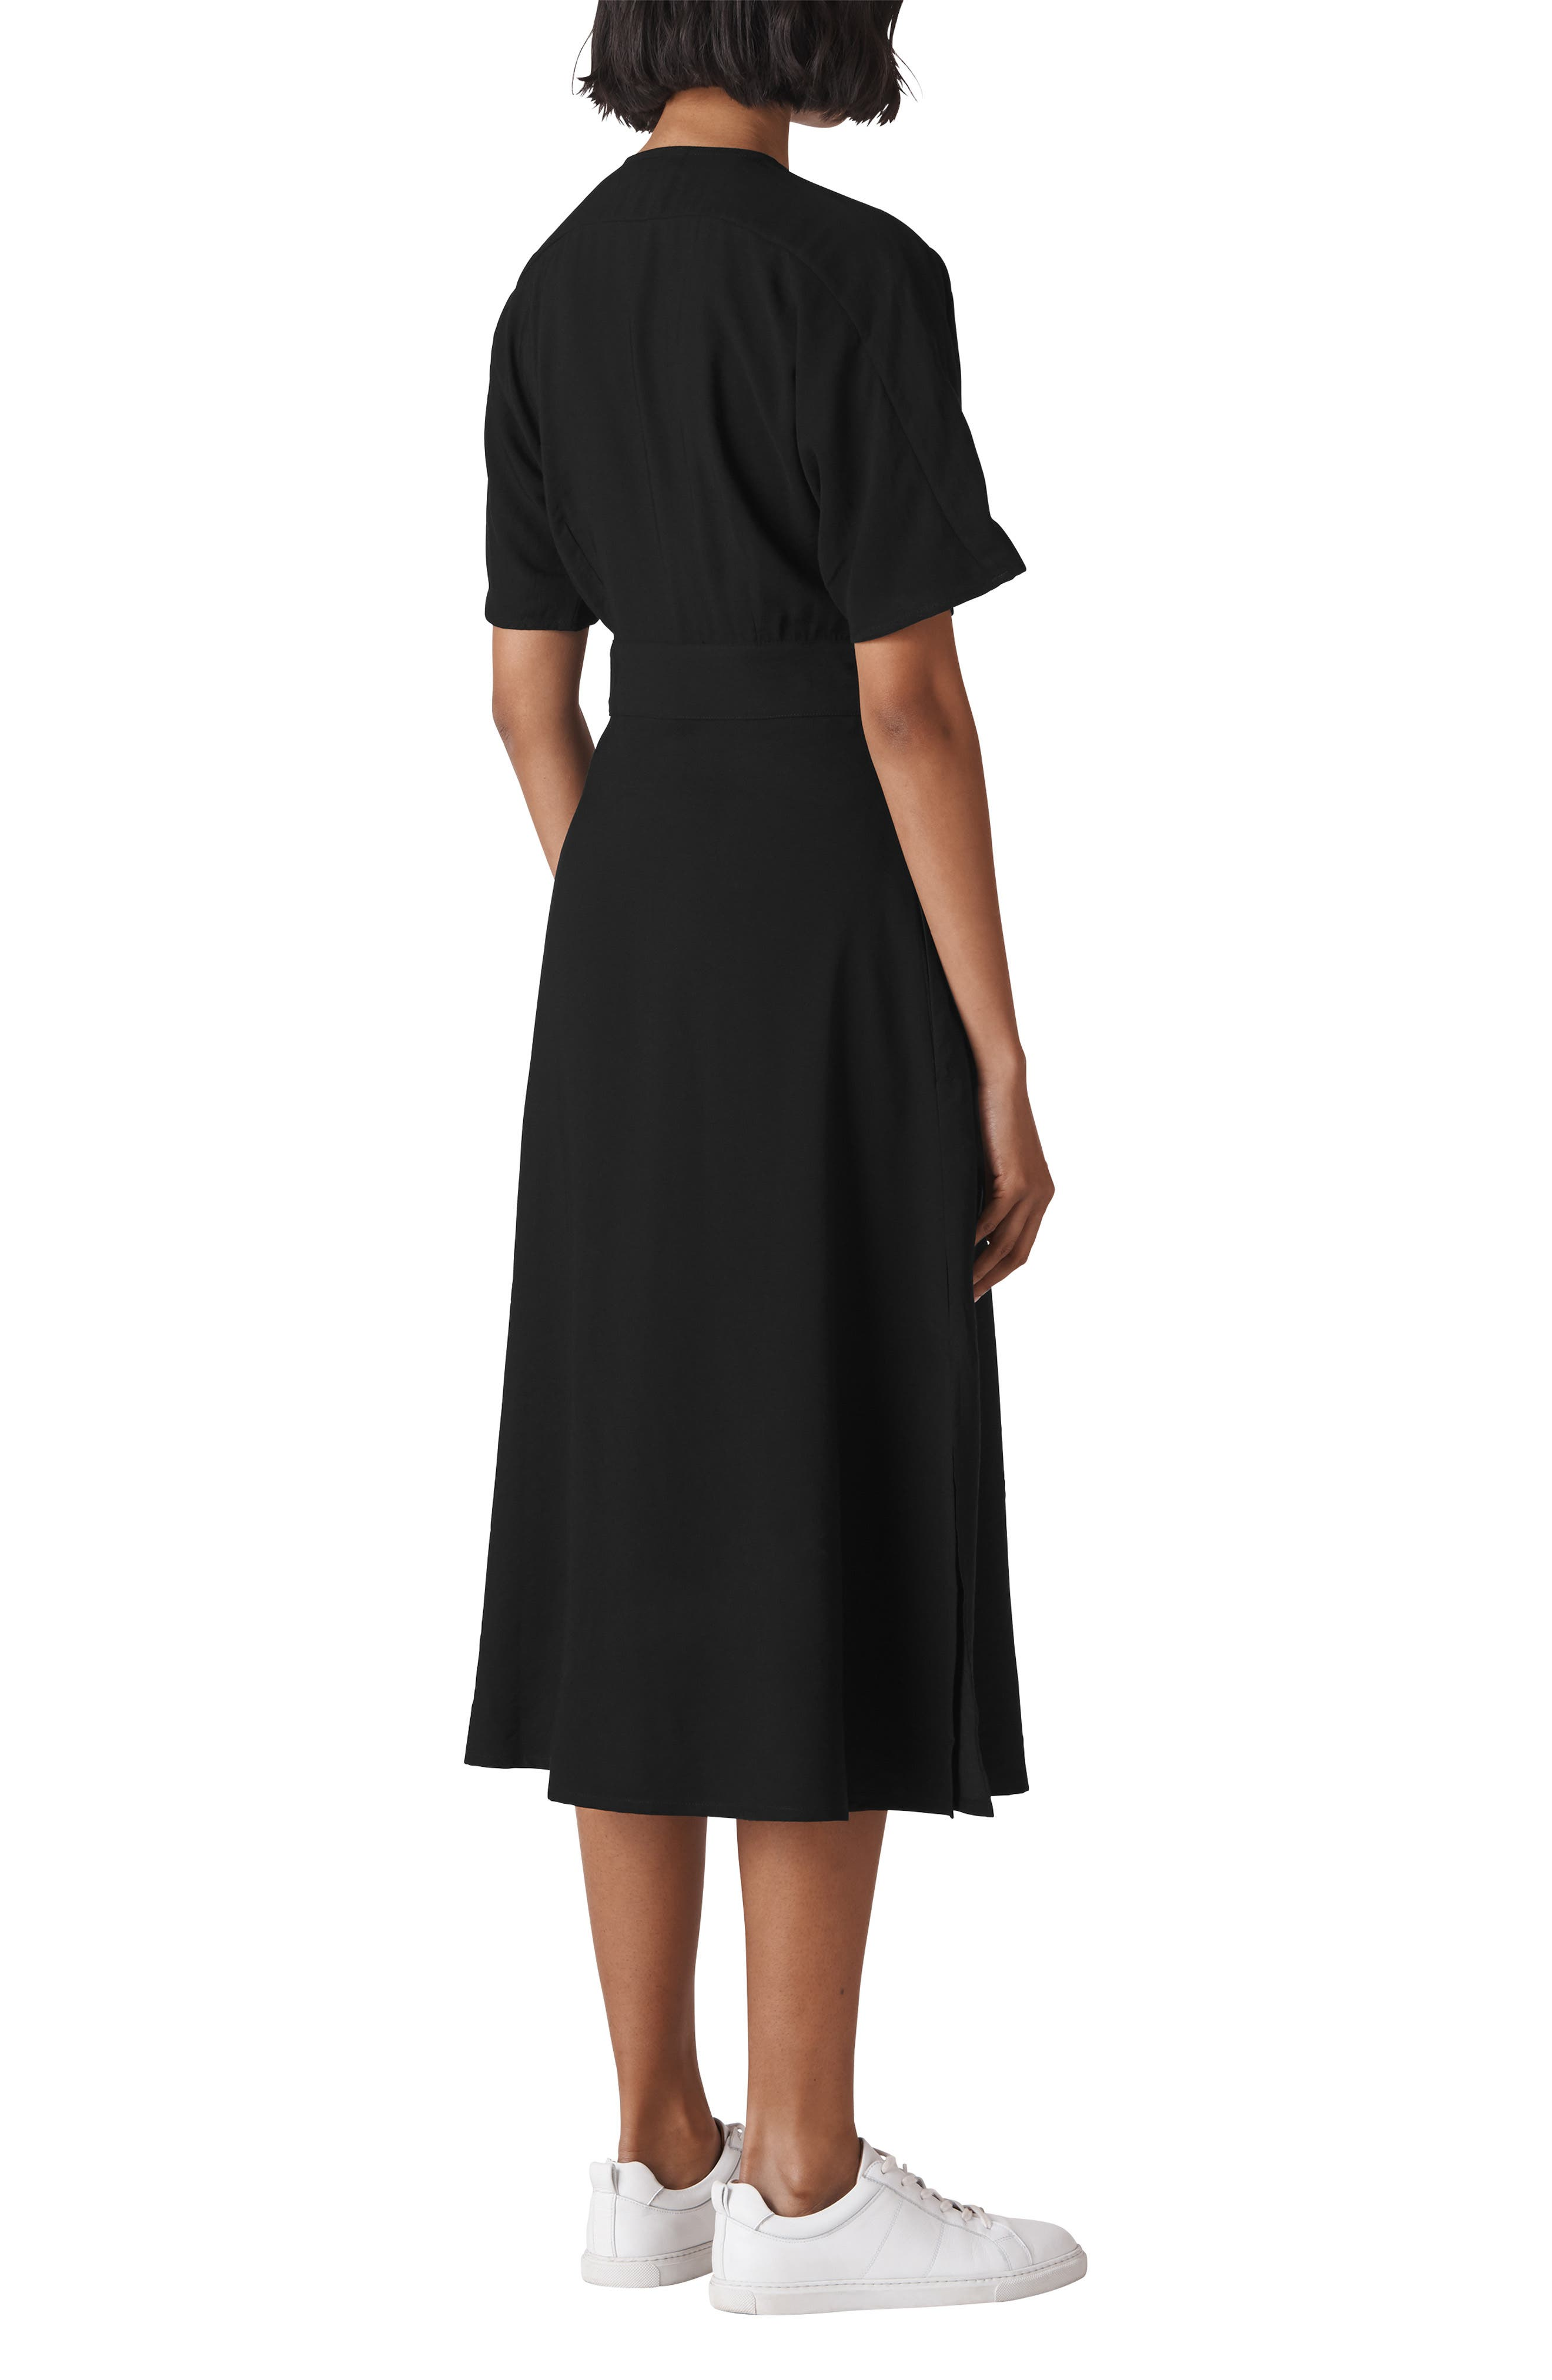 WHISTLES,                             Naya Button Dress,                             Alternate thumbnail 2, color,                             001